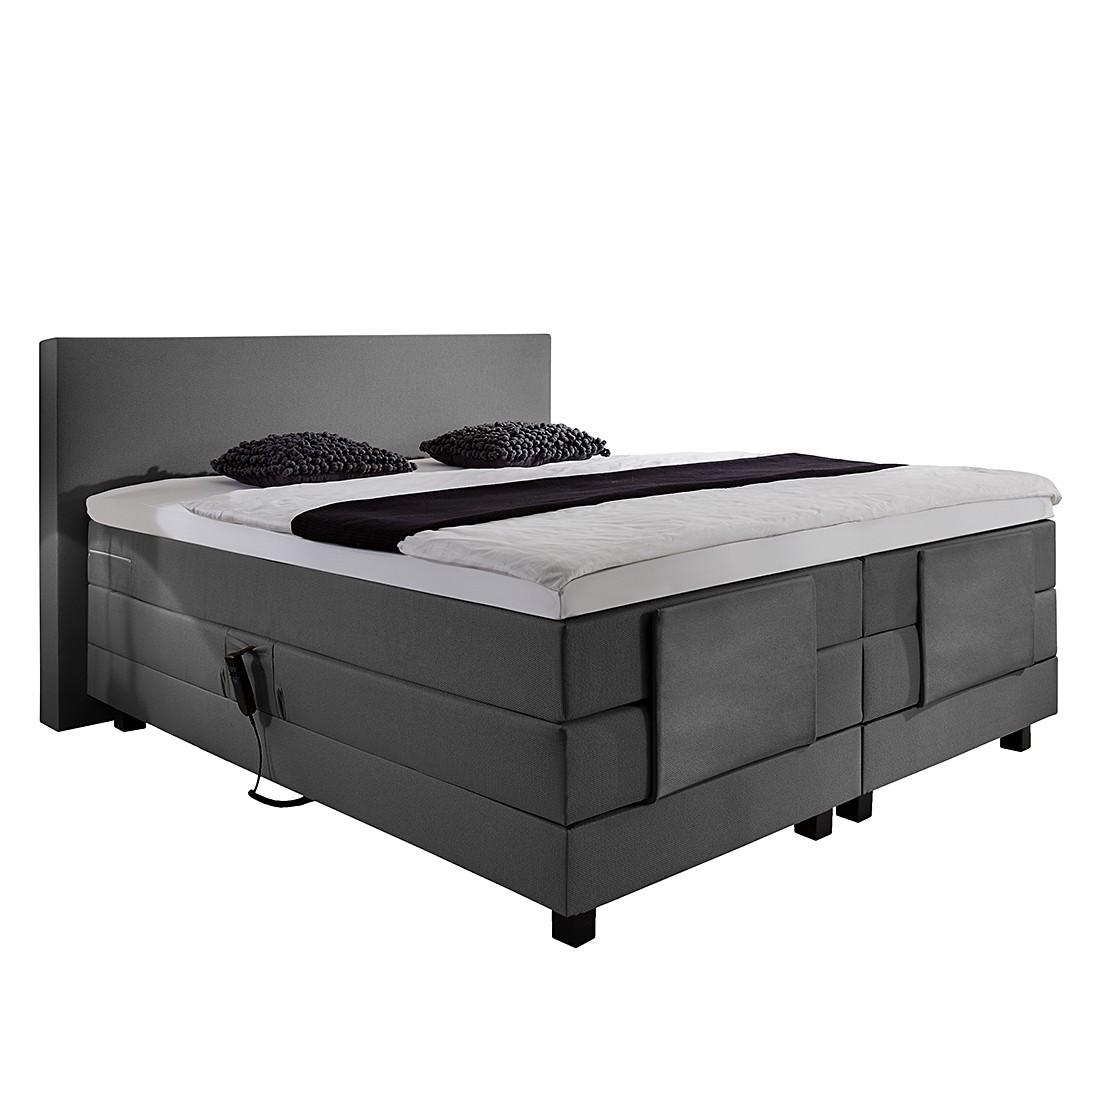 Boxspringbett Jula (motorisch verstellbar) - Inkl. Kaltschaumtopper - Webstoff - 140 x 200cm - H2 bis 80 kg - Grau, Fredriks